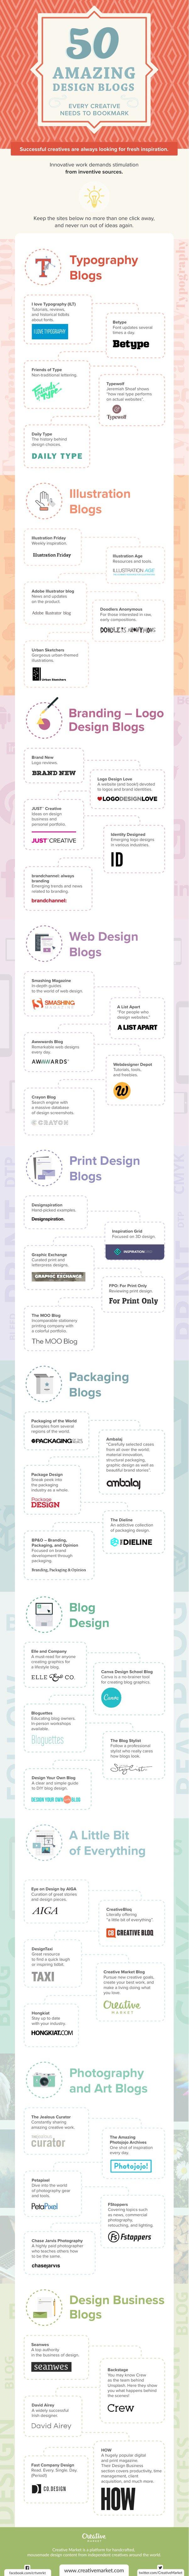 Top 50 design blogs for inspiring web designers and web developers